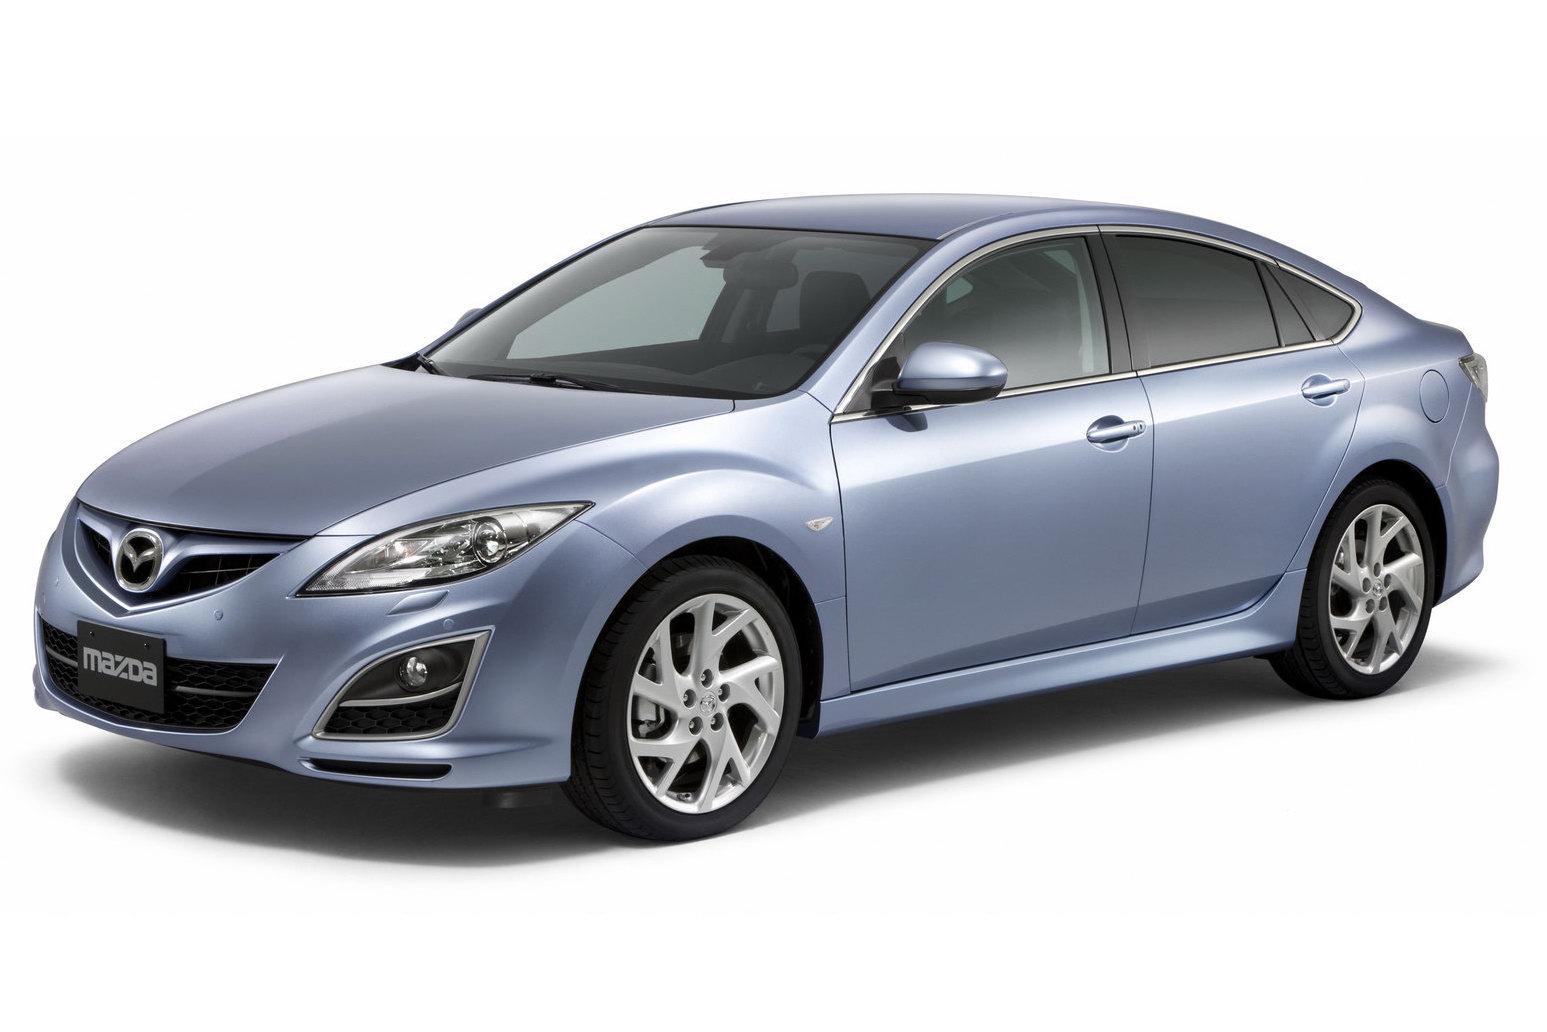 Kekurangan Mazda 6 2011 Harga